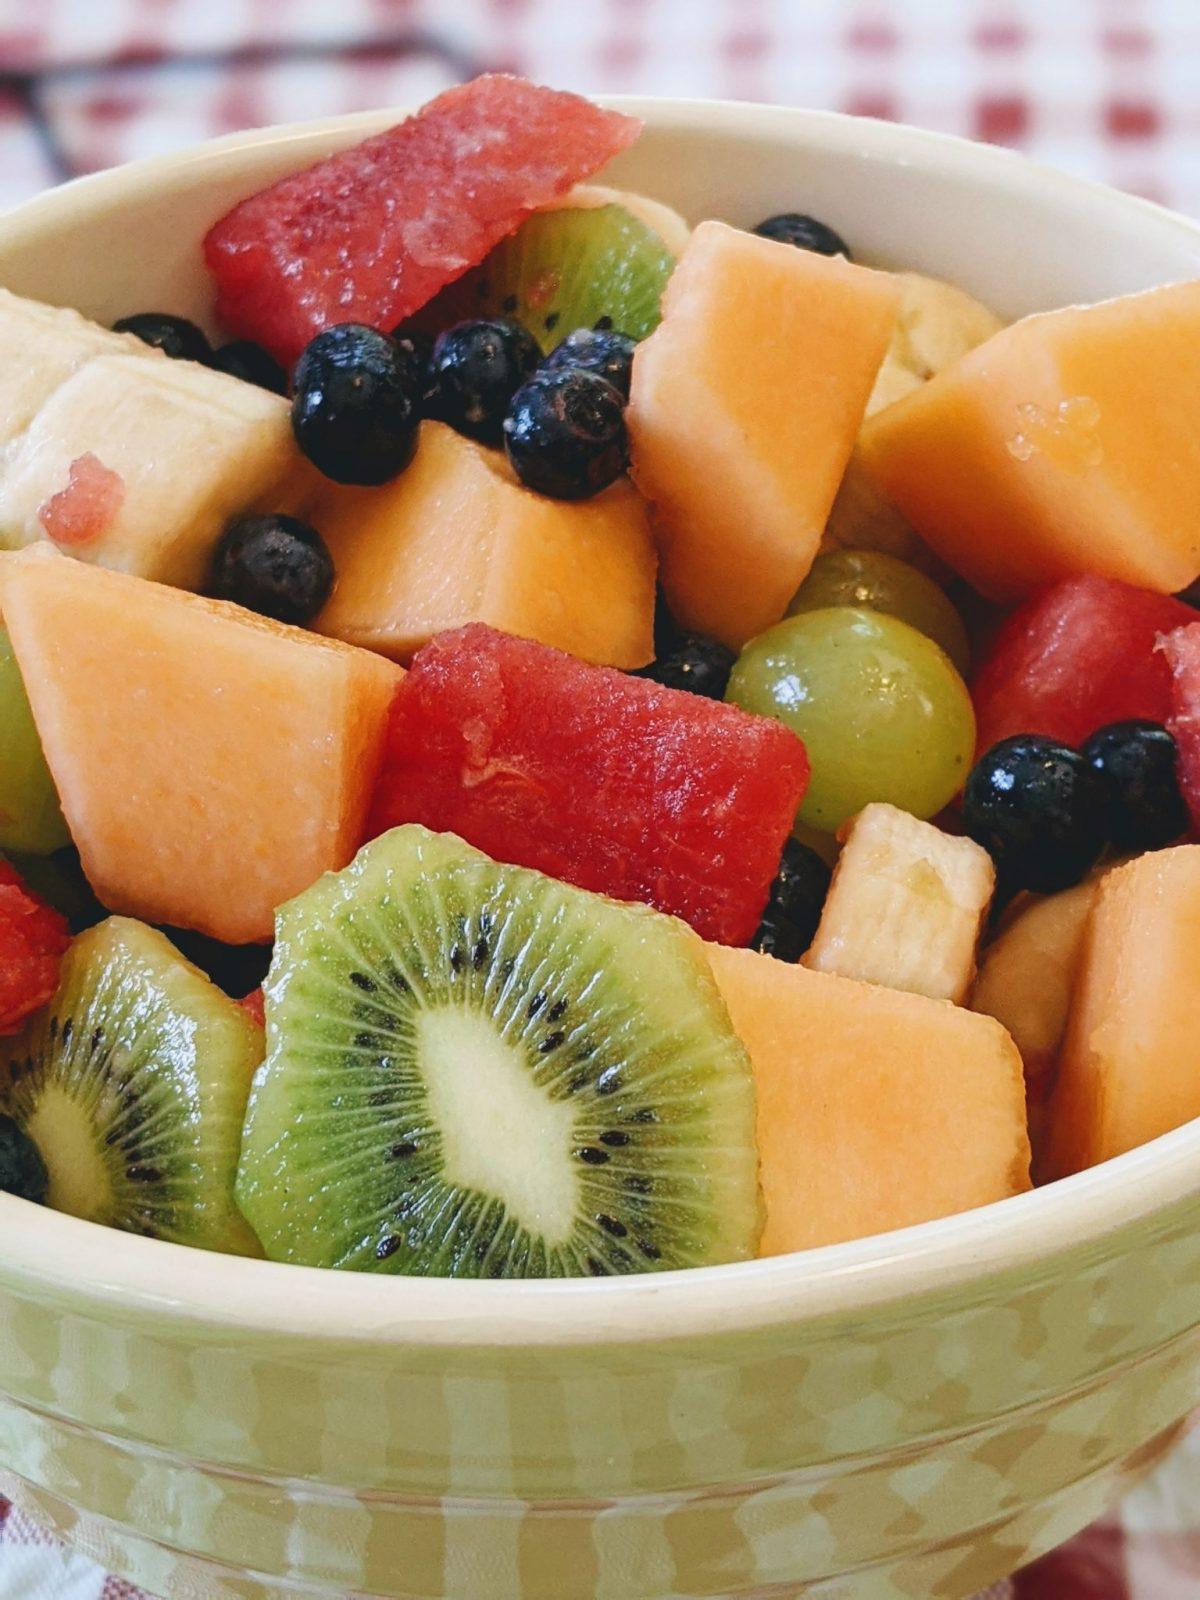 bowl of watermelon, blueberries, grapes, canteloupe, kiwi